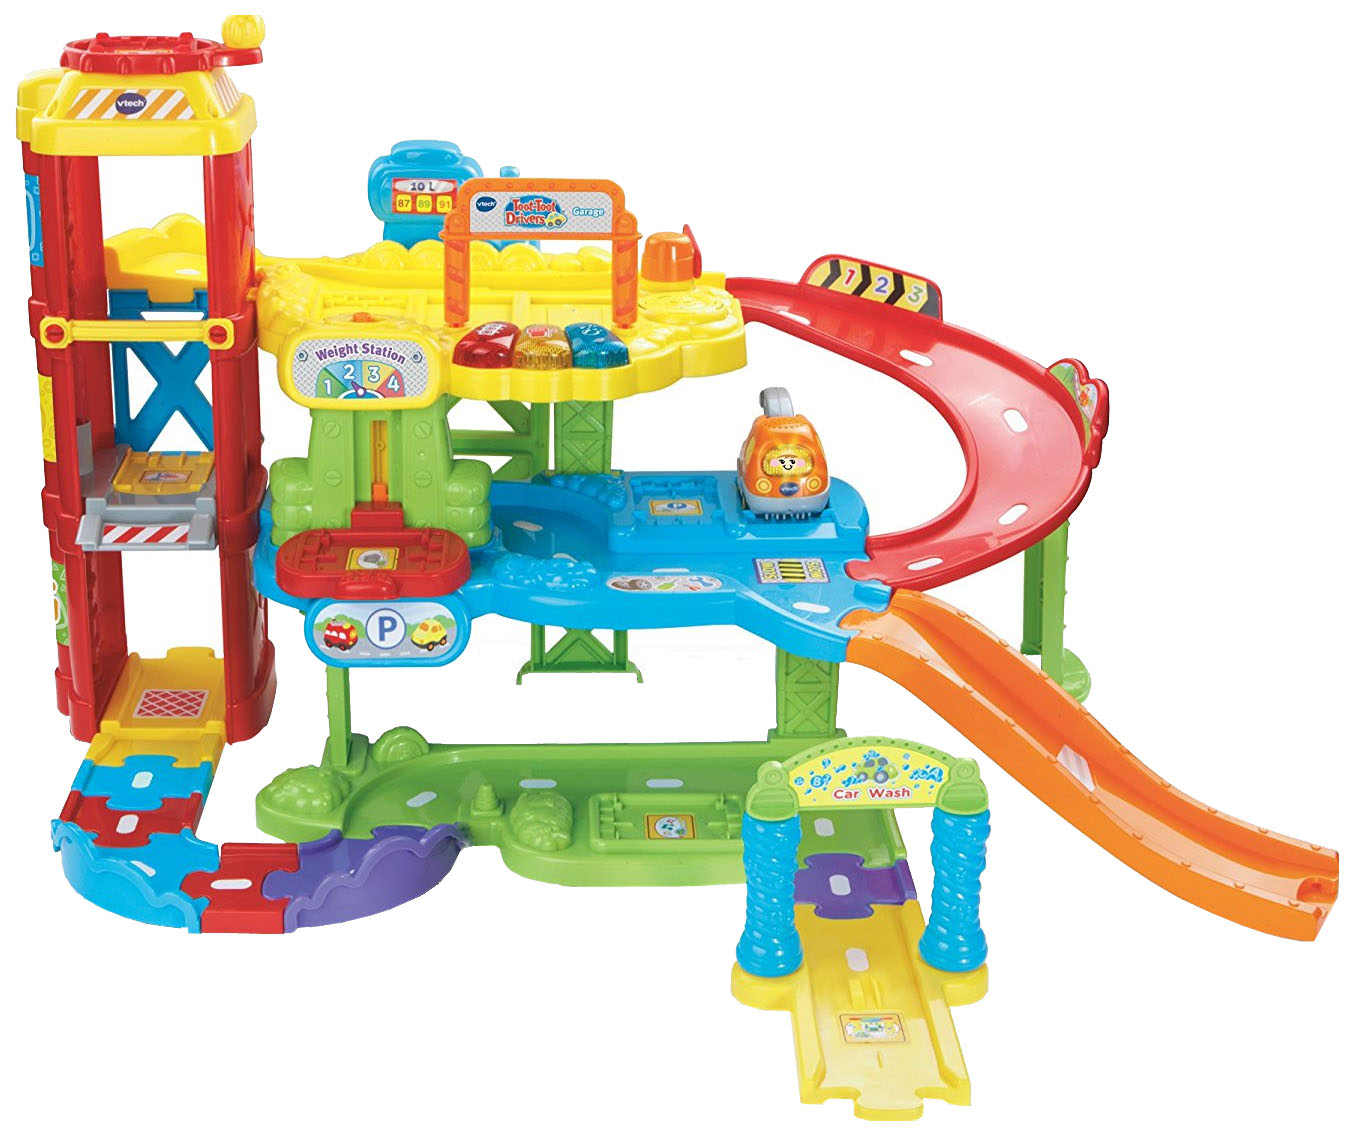 Гараж игрушечный VTech Бип-Бип 80-180026 купить во Vseblaga.ru